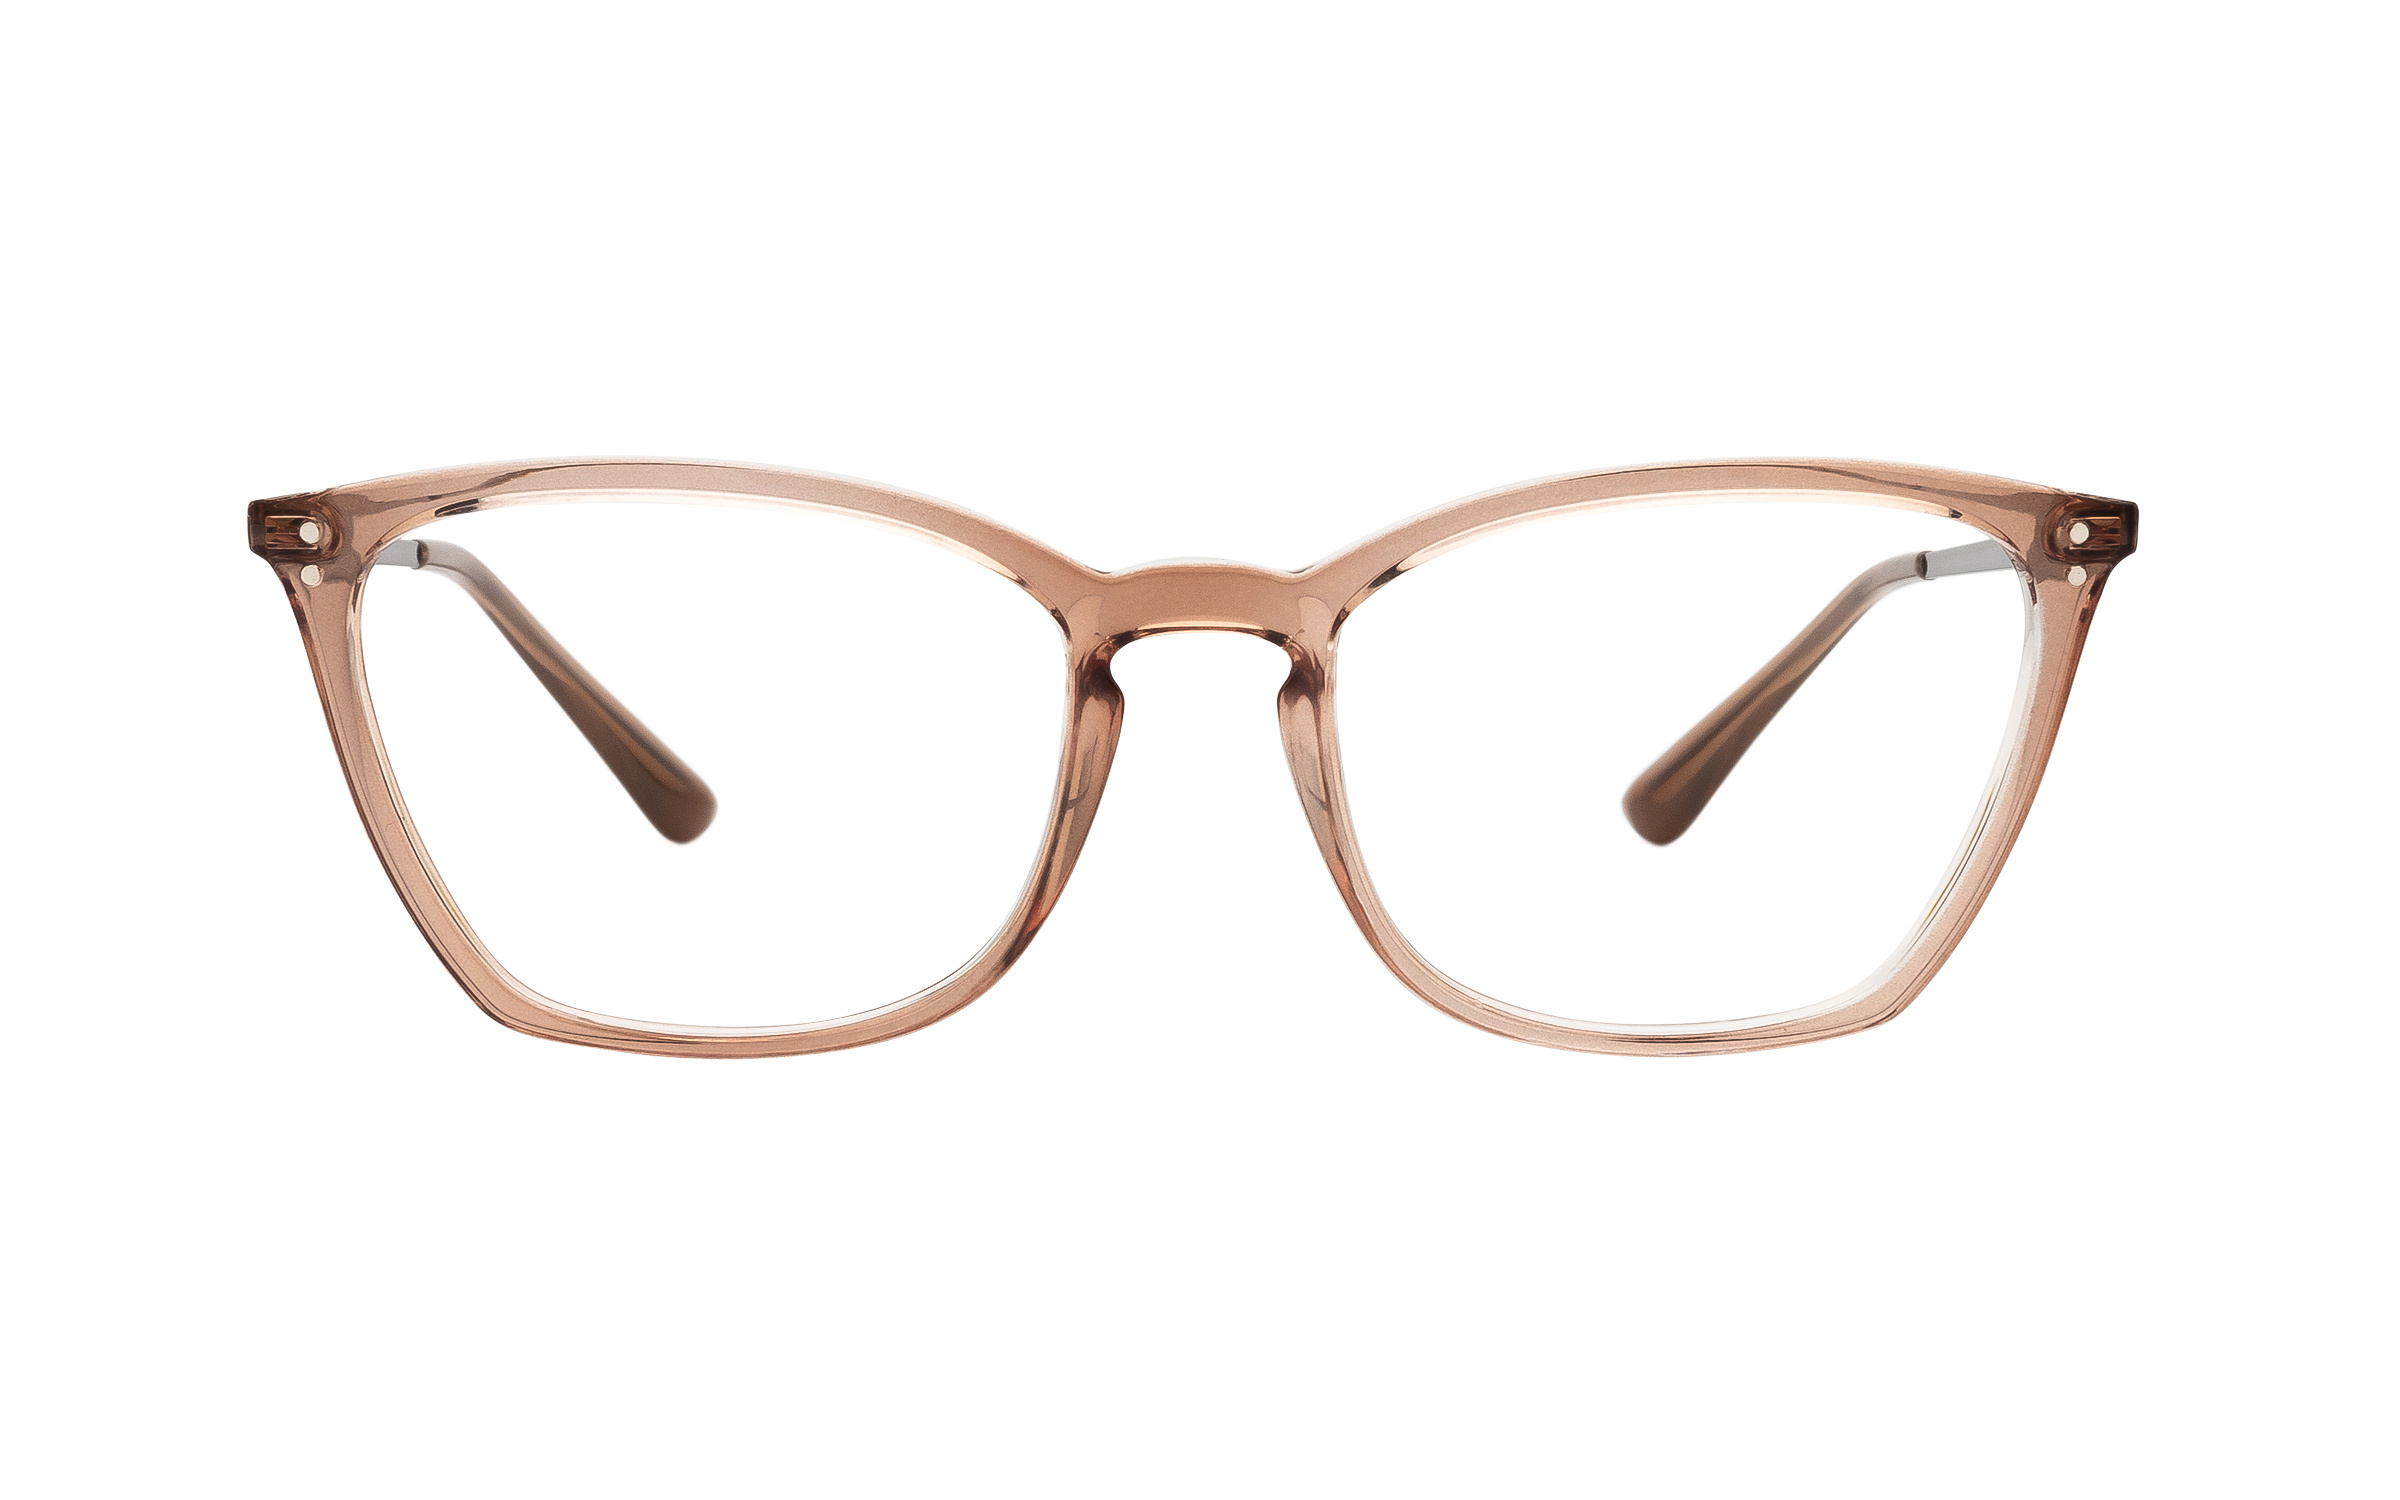 coastal.com - Vogue VO5277 75746 (51) Eyeglasses and Frame in Crystal Brown | Acetate/Metal – Online Coastal 136.00 USD